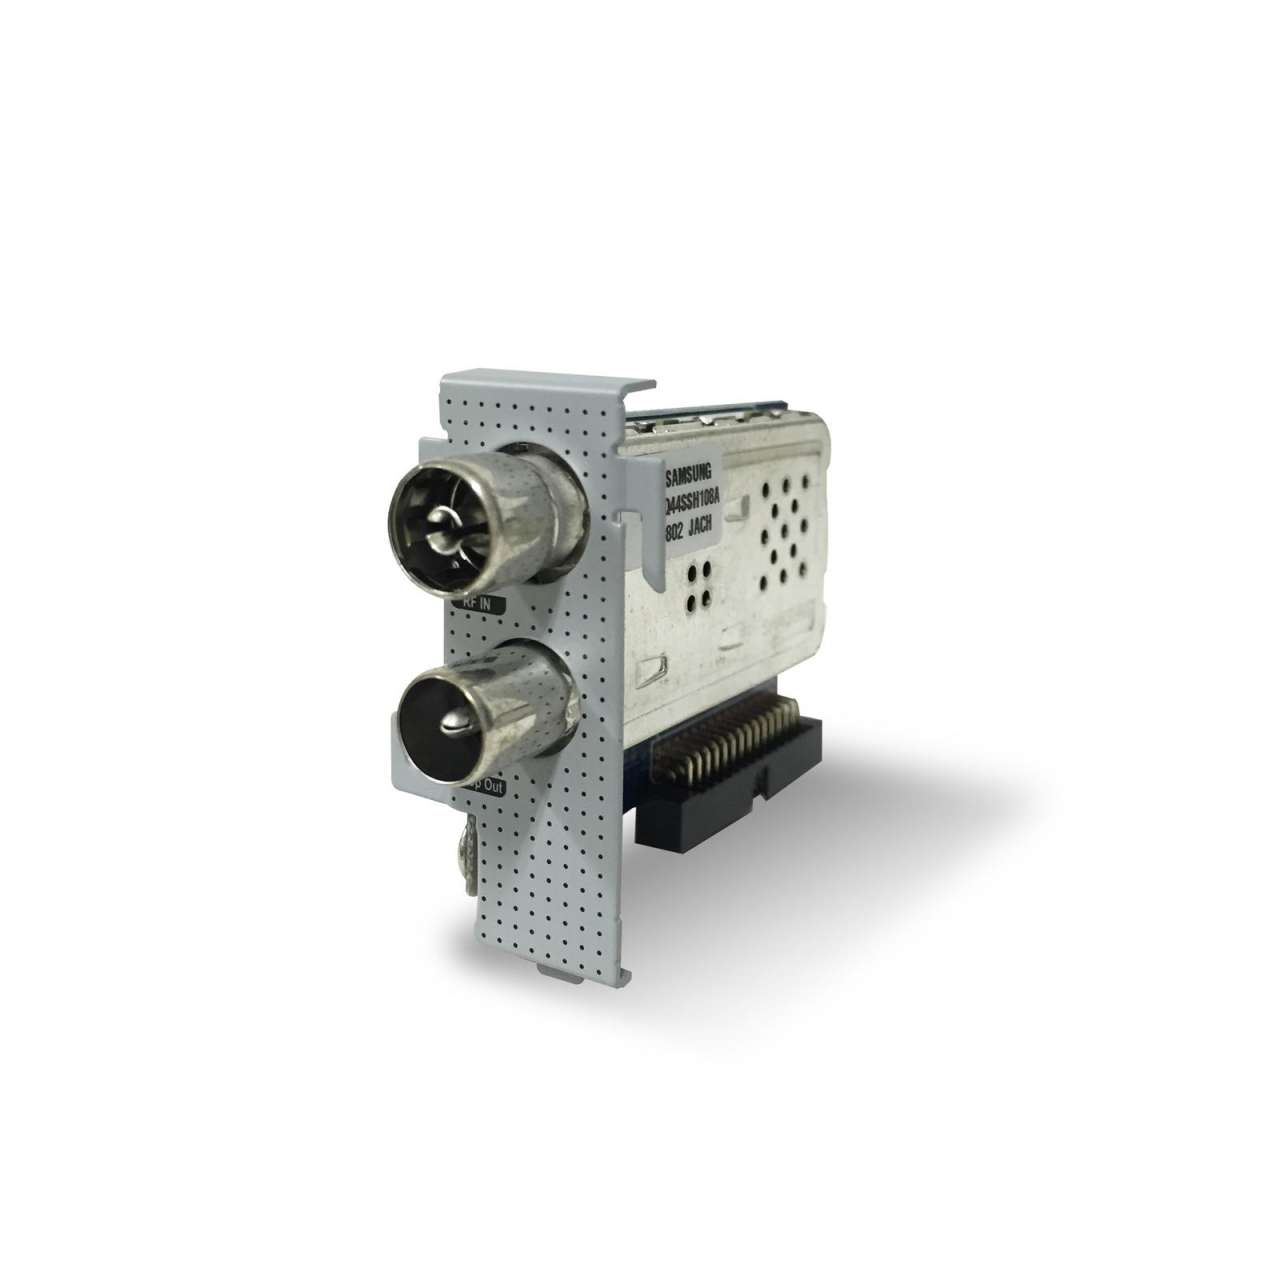 Formuler F4 Turbo Plug & Play DVB-C/T2 Hybrid HDTV Tuner FORZUB003